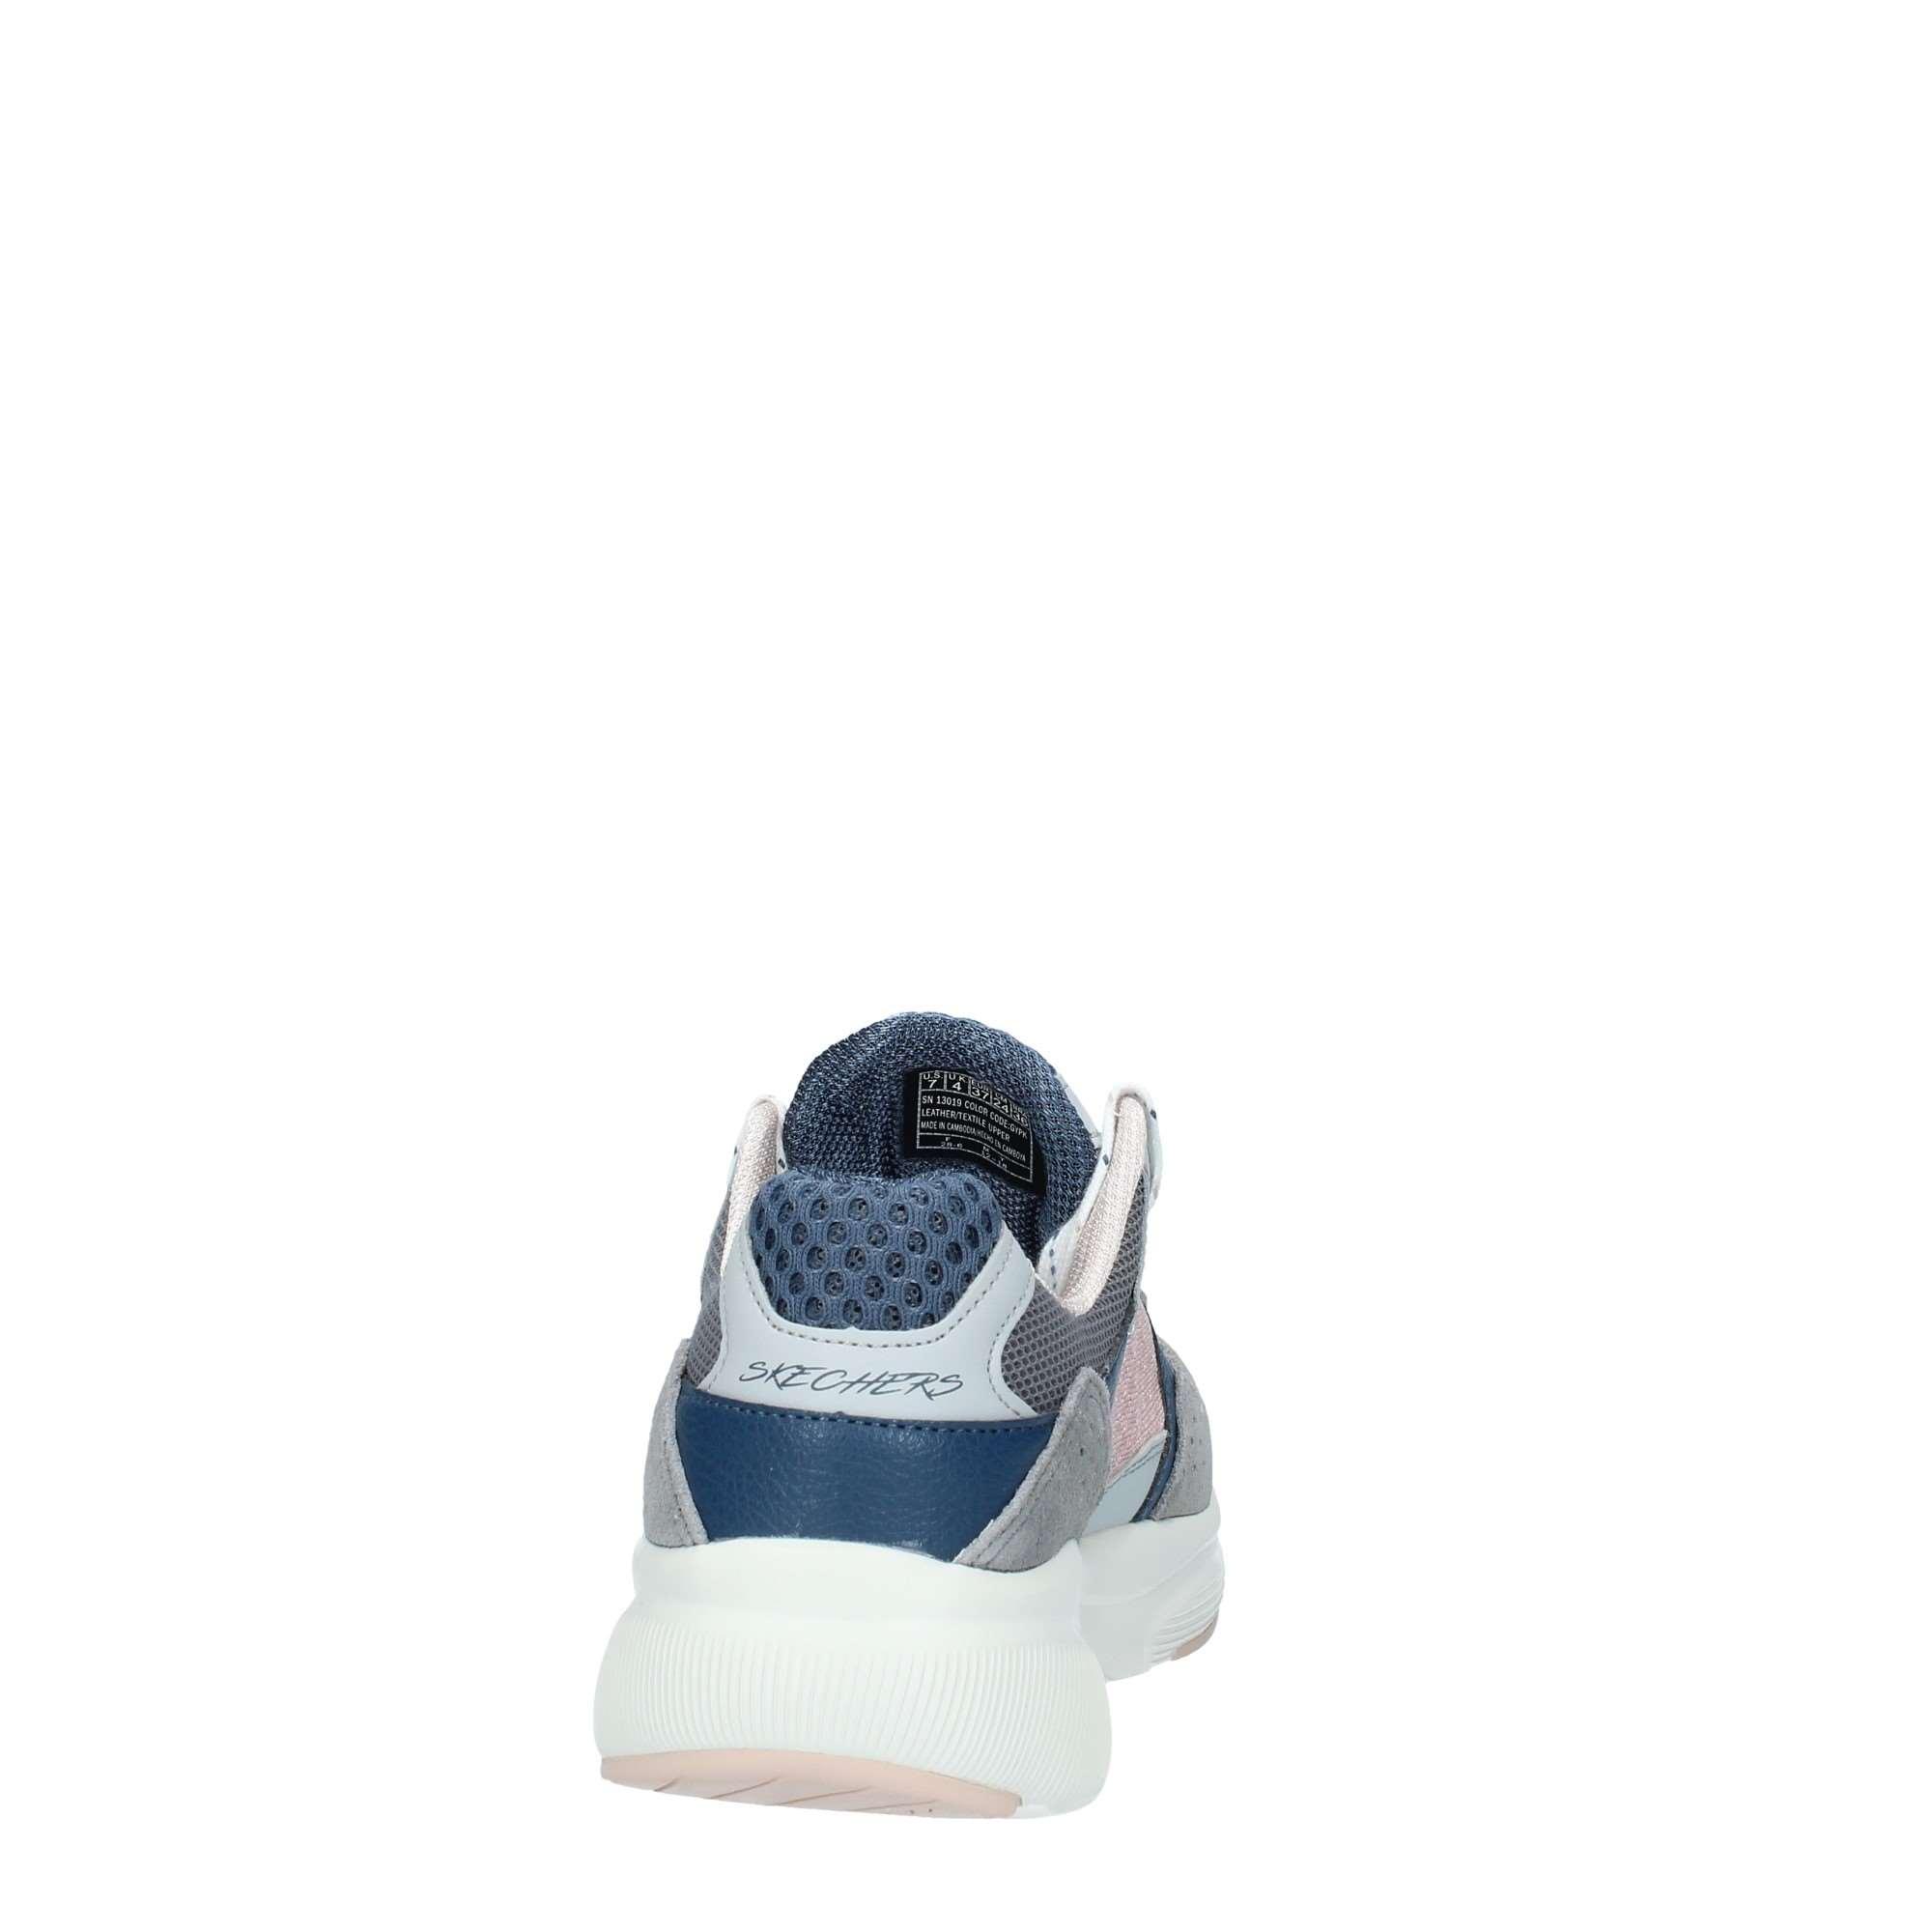 Skechers sneaker donna meridian 13019 gypk n°40 | eBay